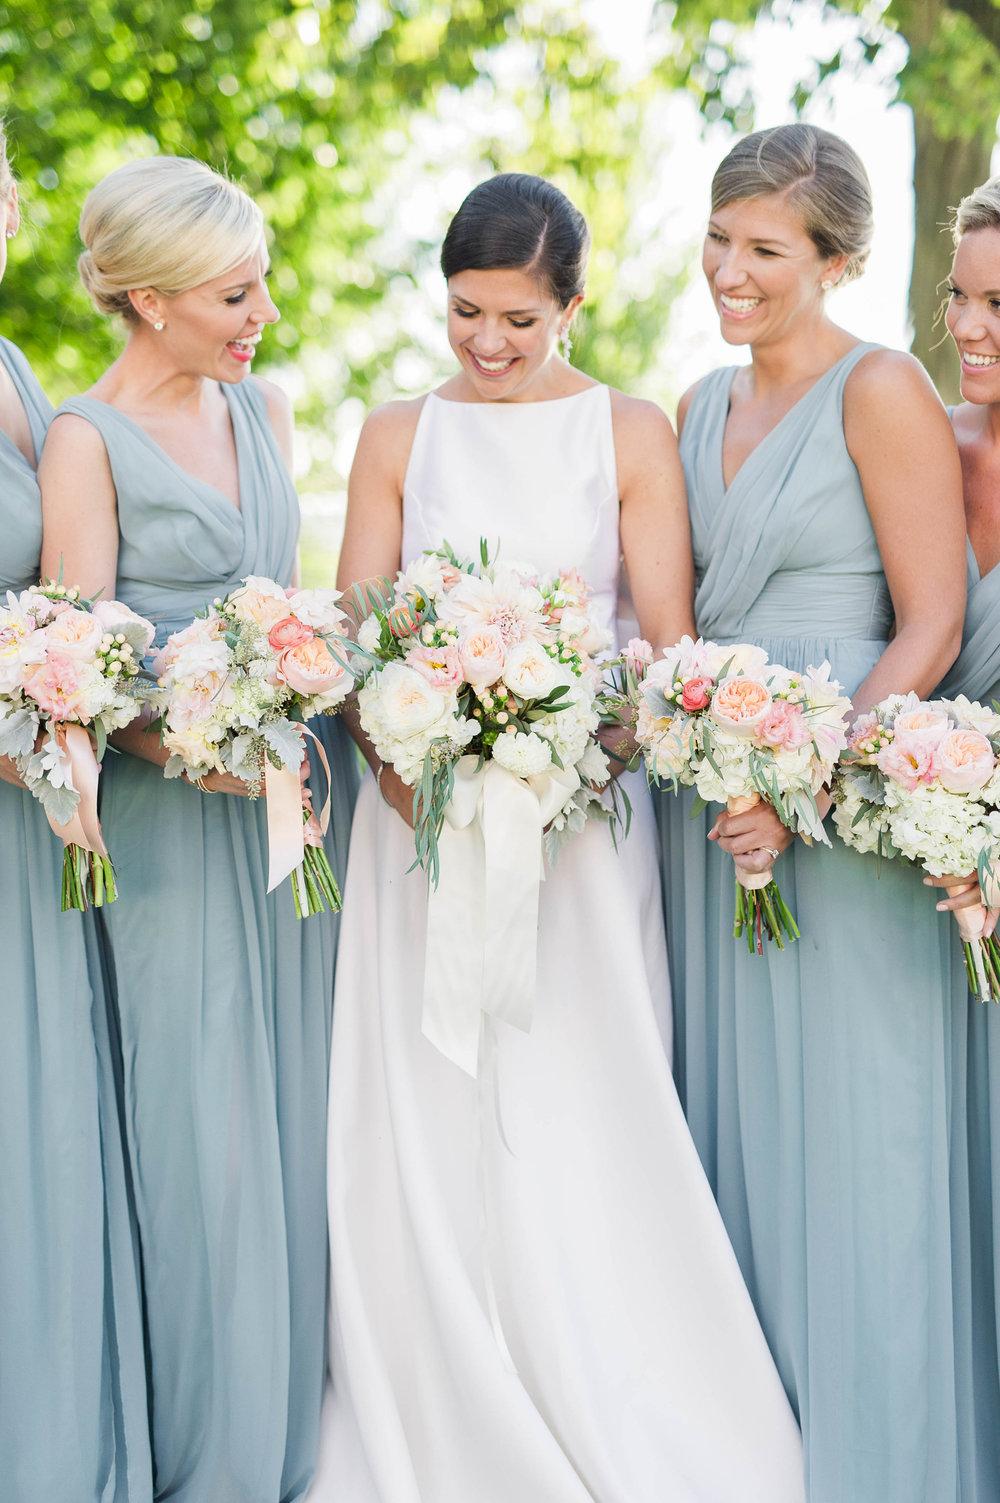 shanleigh anthony wedding-final print files 2-0407.jpg